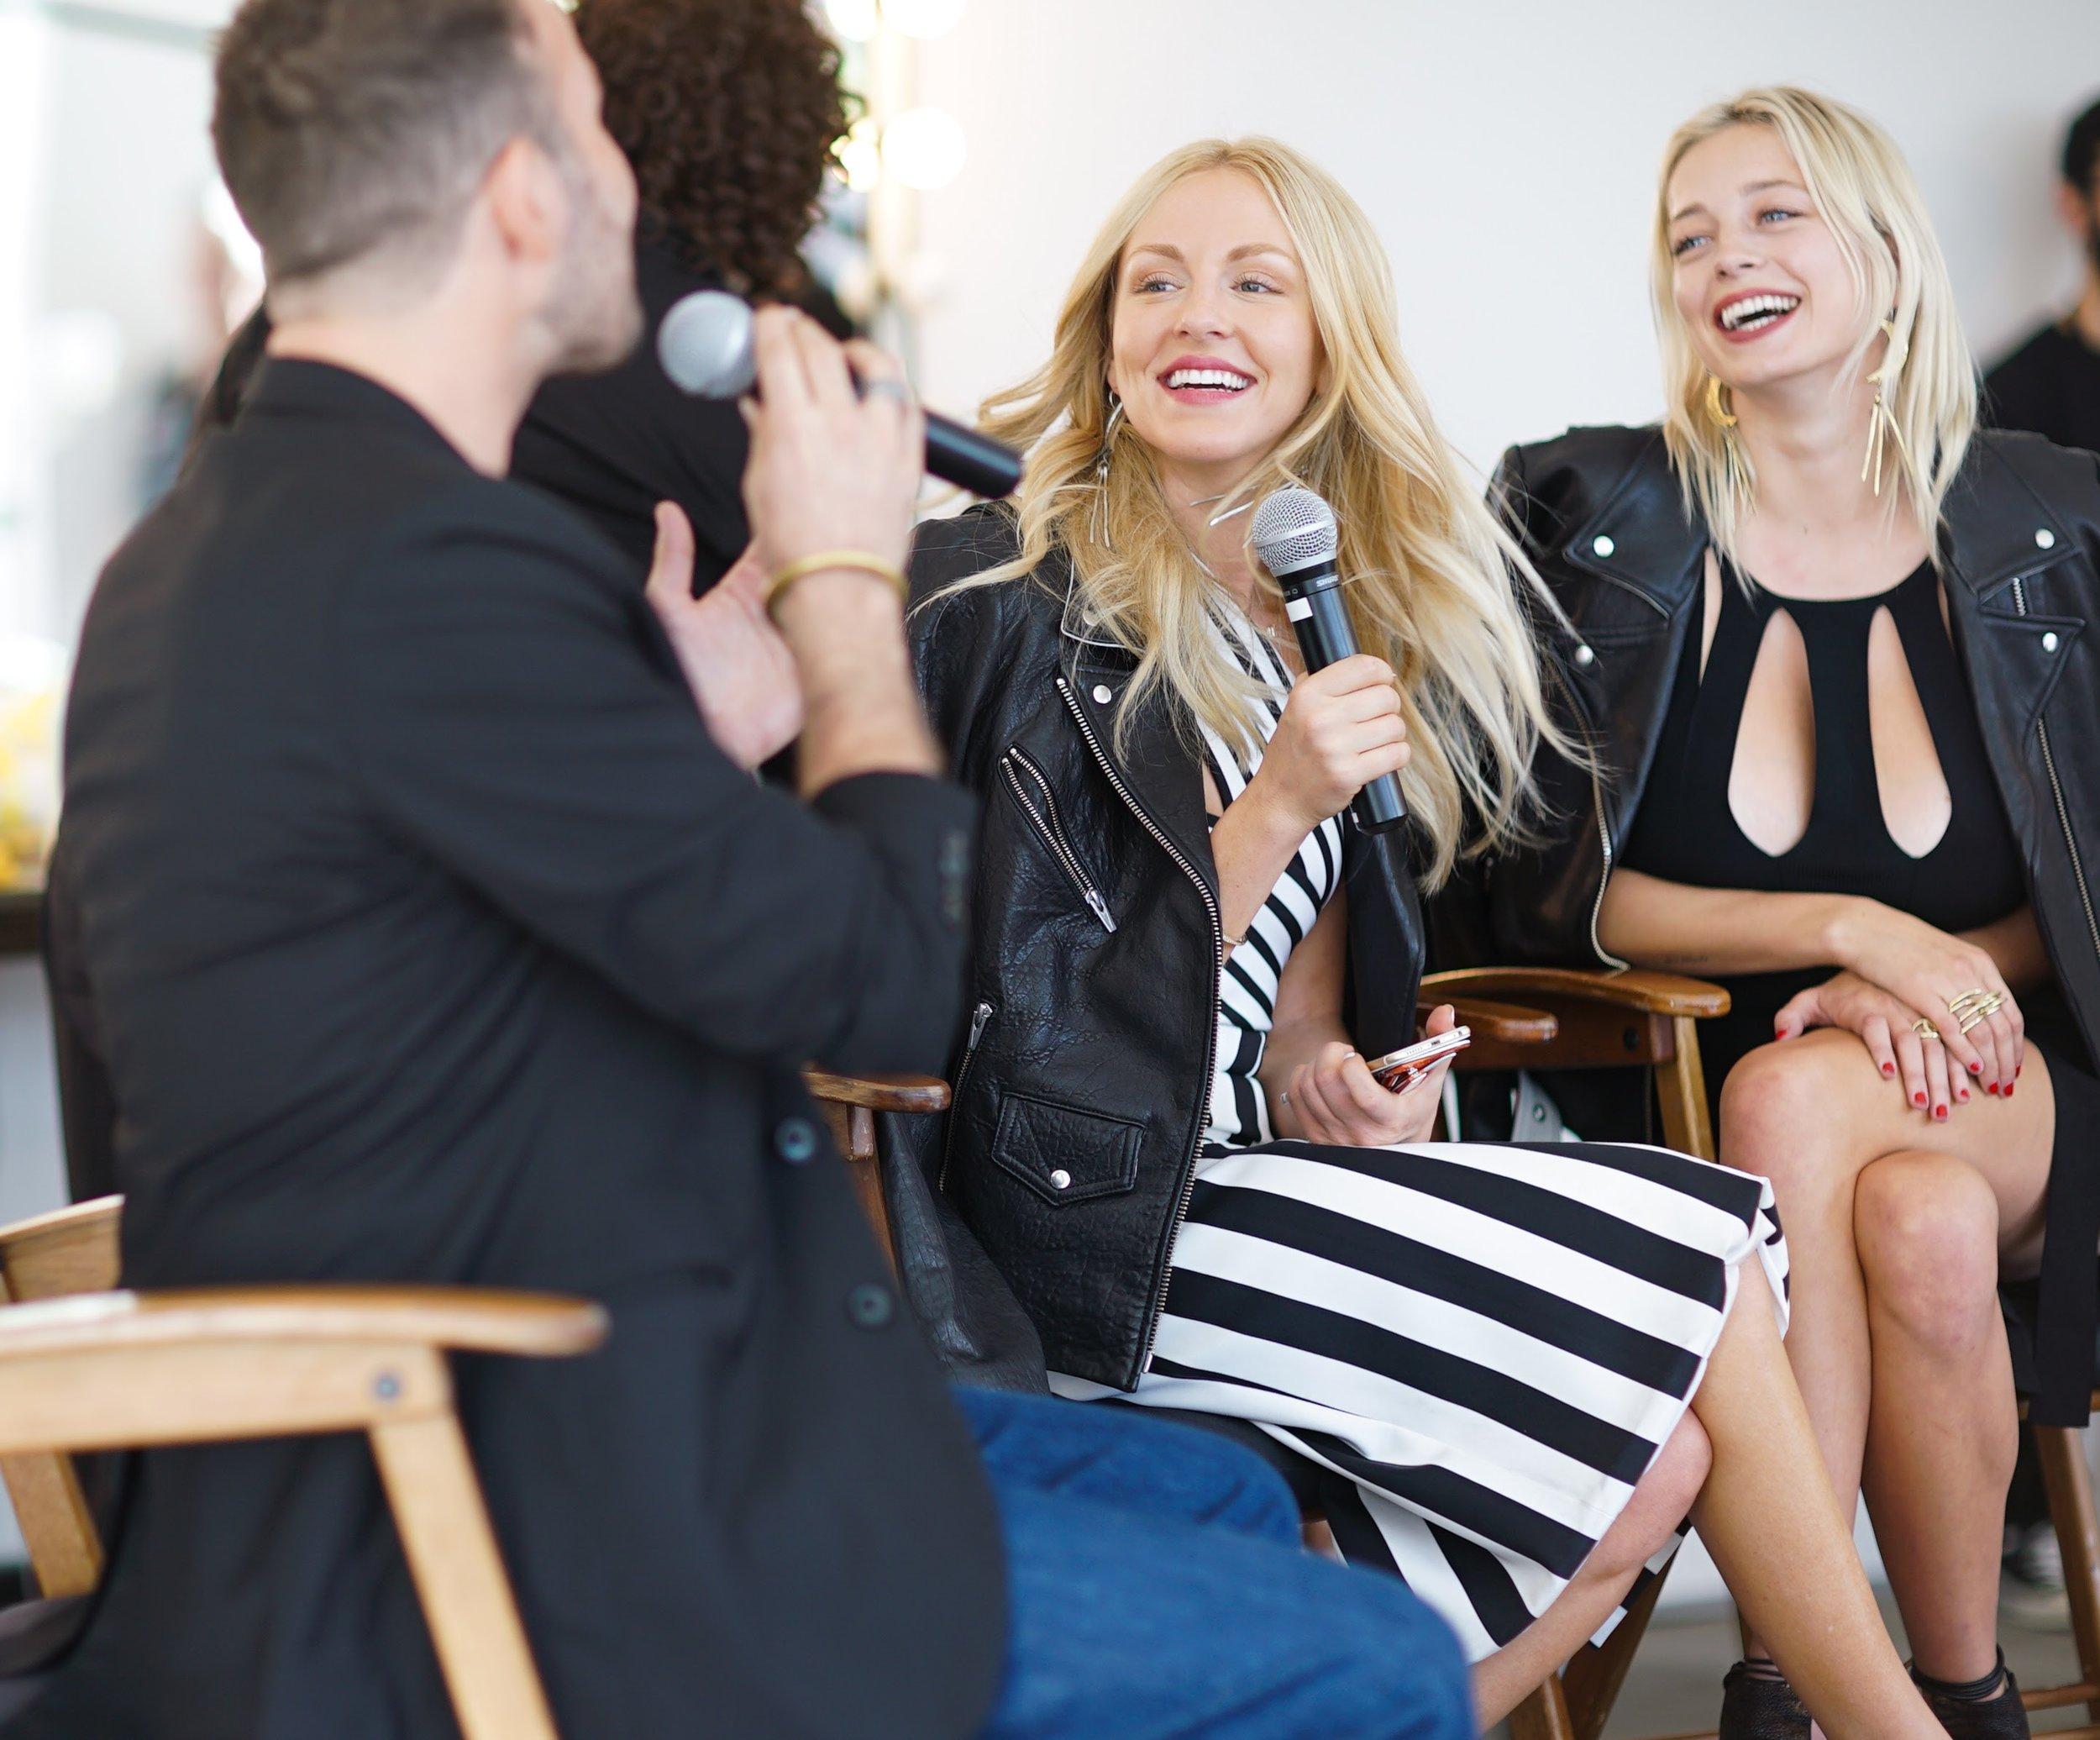 Micah Jesse interviews Caroline Vreeland and Shea Marie